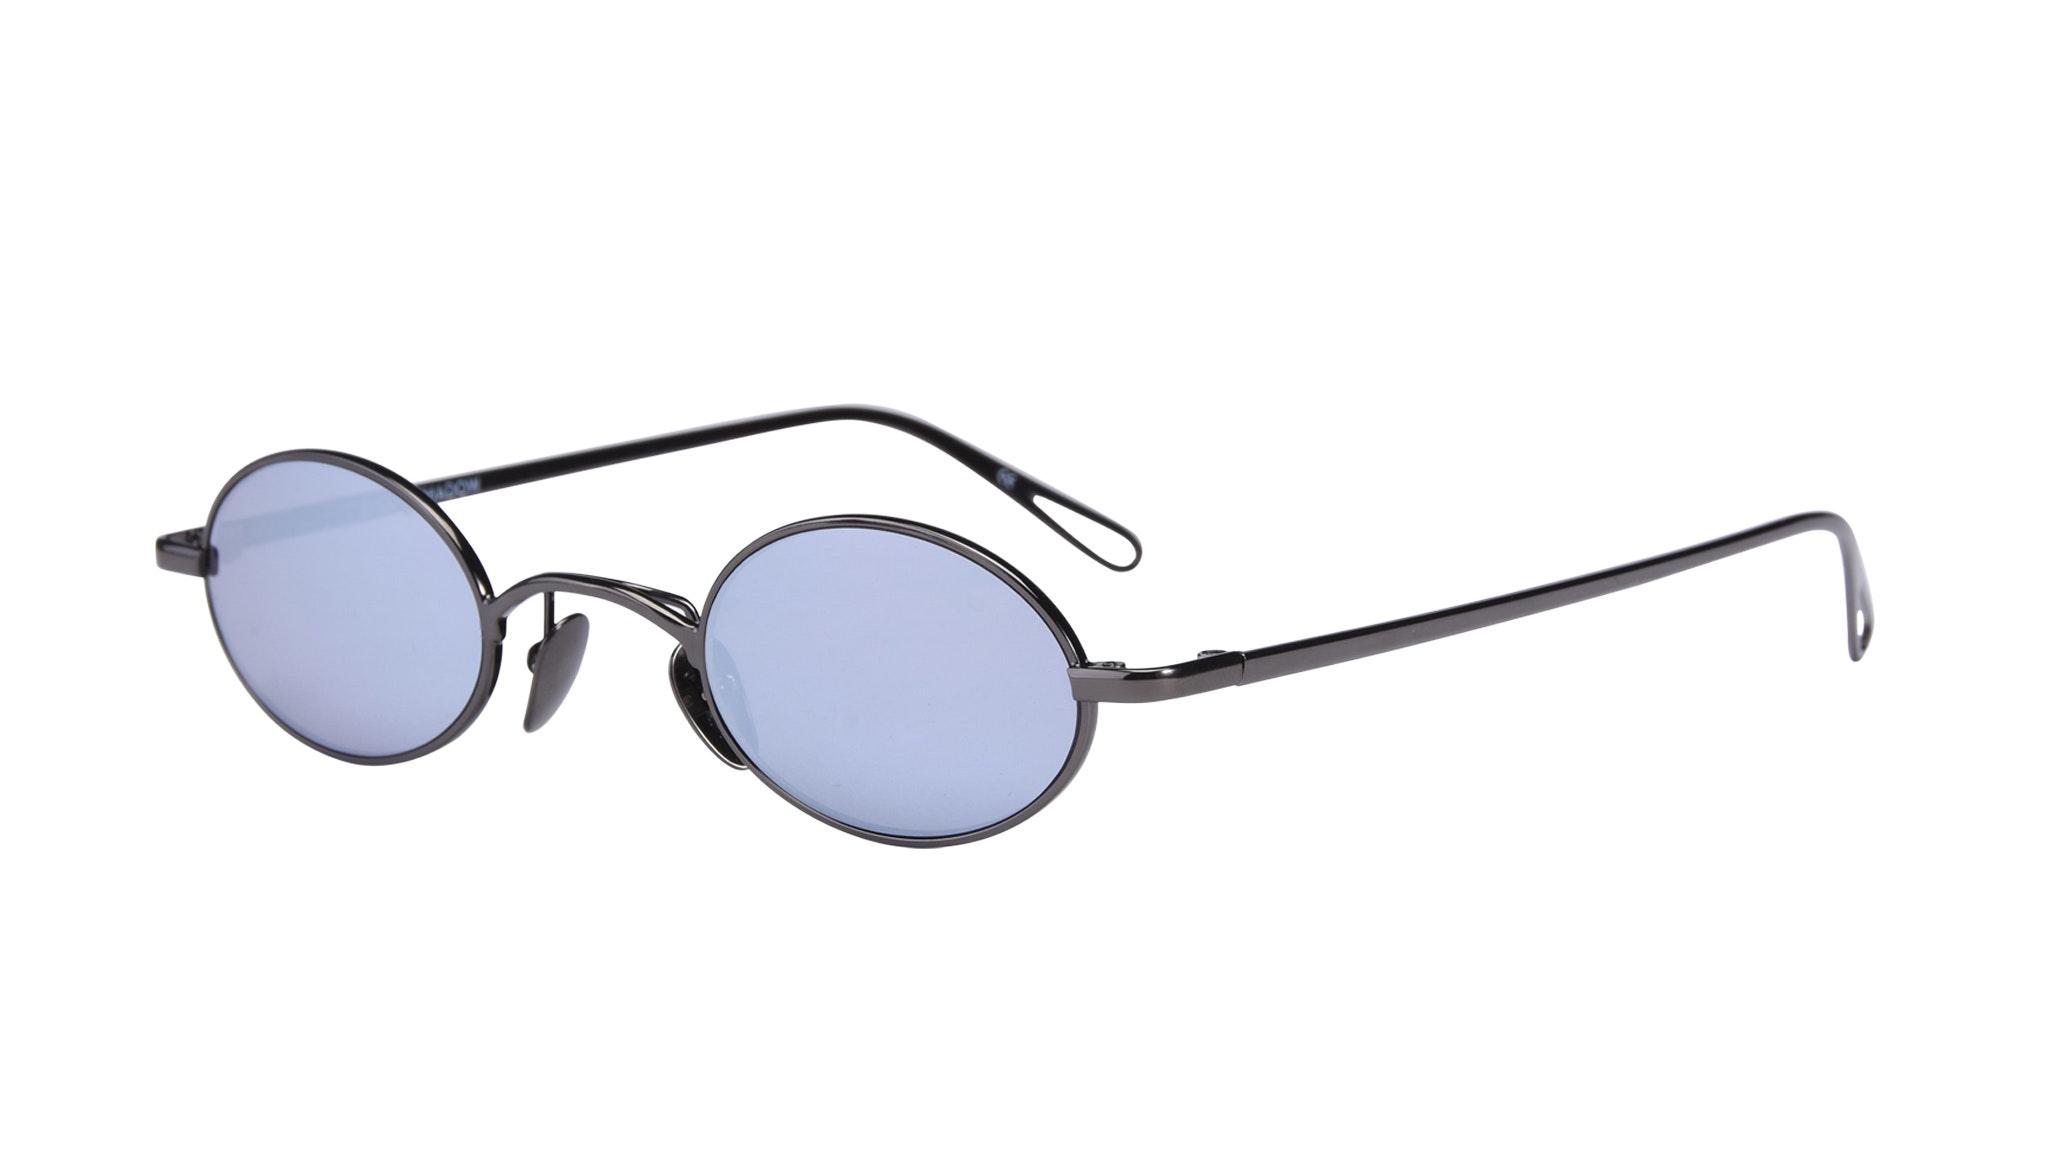 Affordable Fashion Glasses Round Sunglasses Women Stellar Shadow Tilt